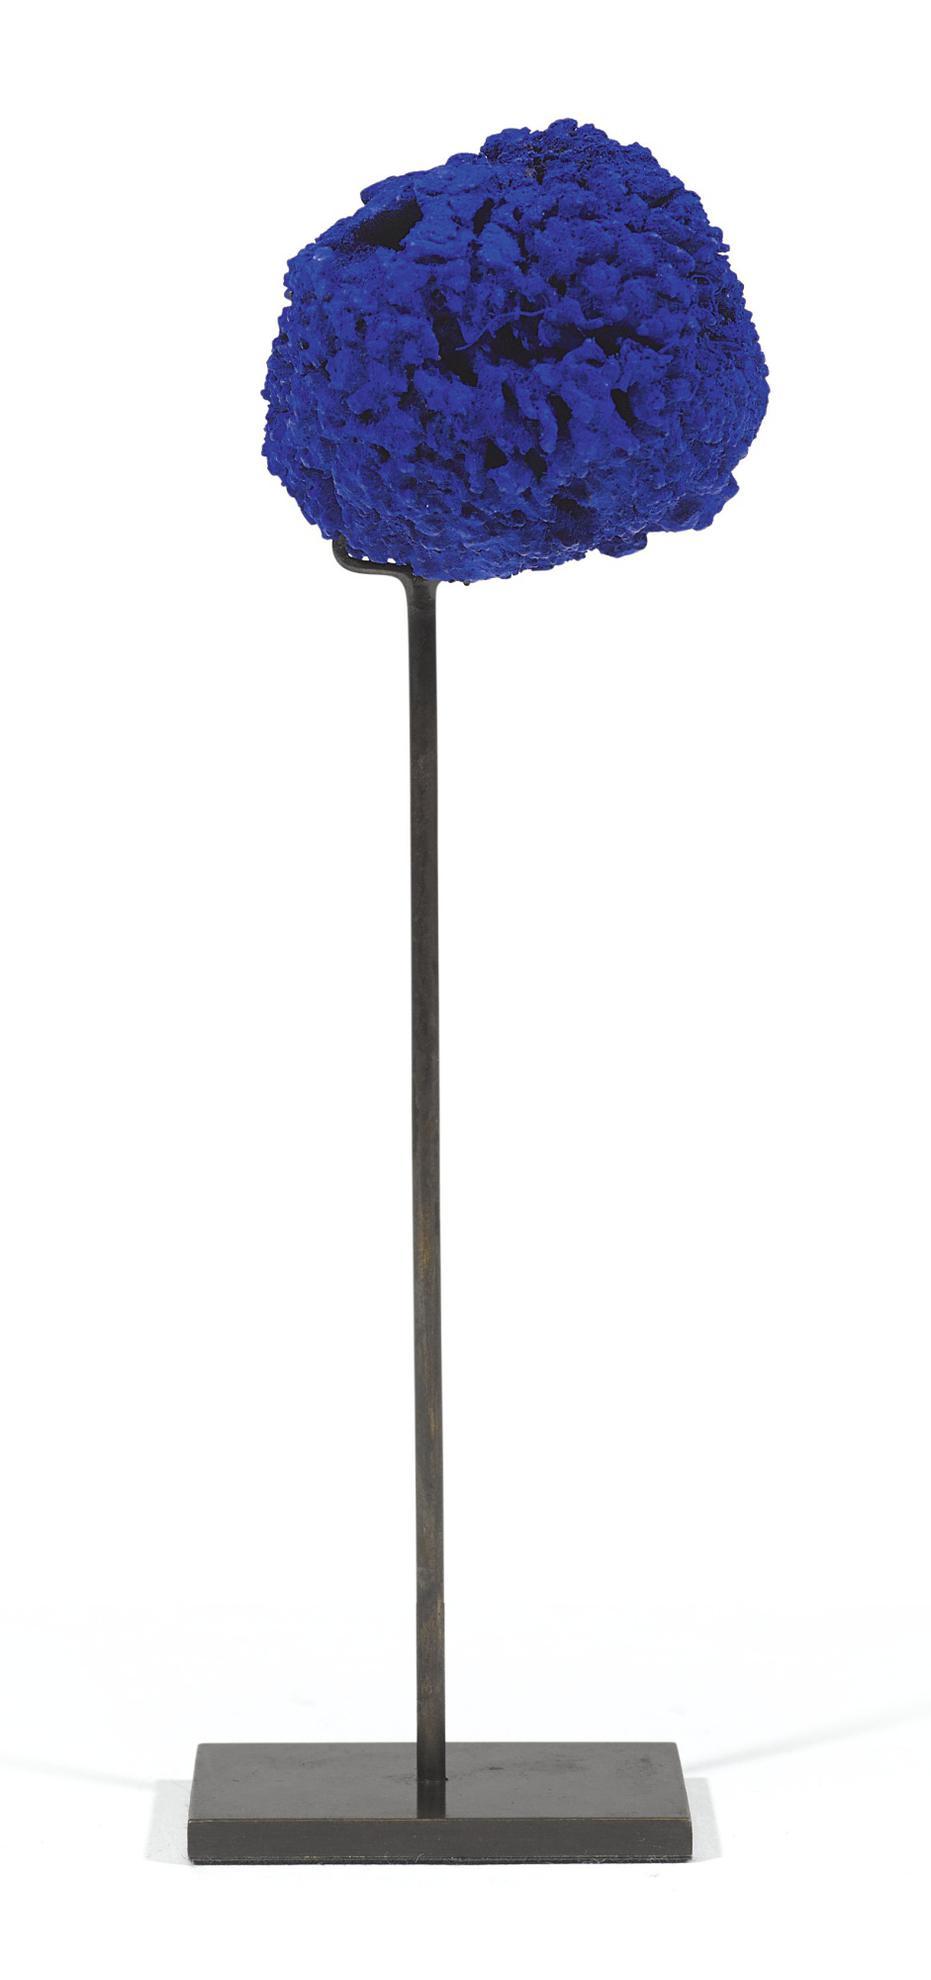 Yves Klein-Untitled Blue Sponge Sculpture (Se 303)-1961